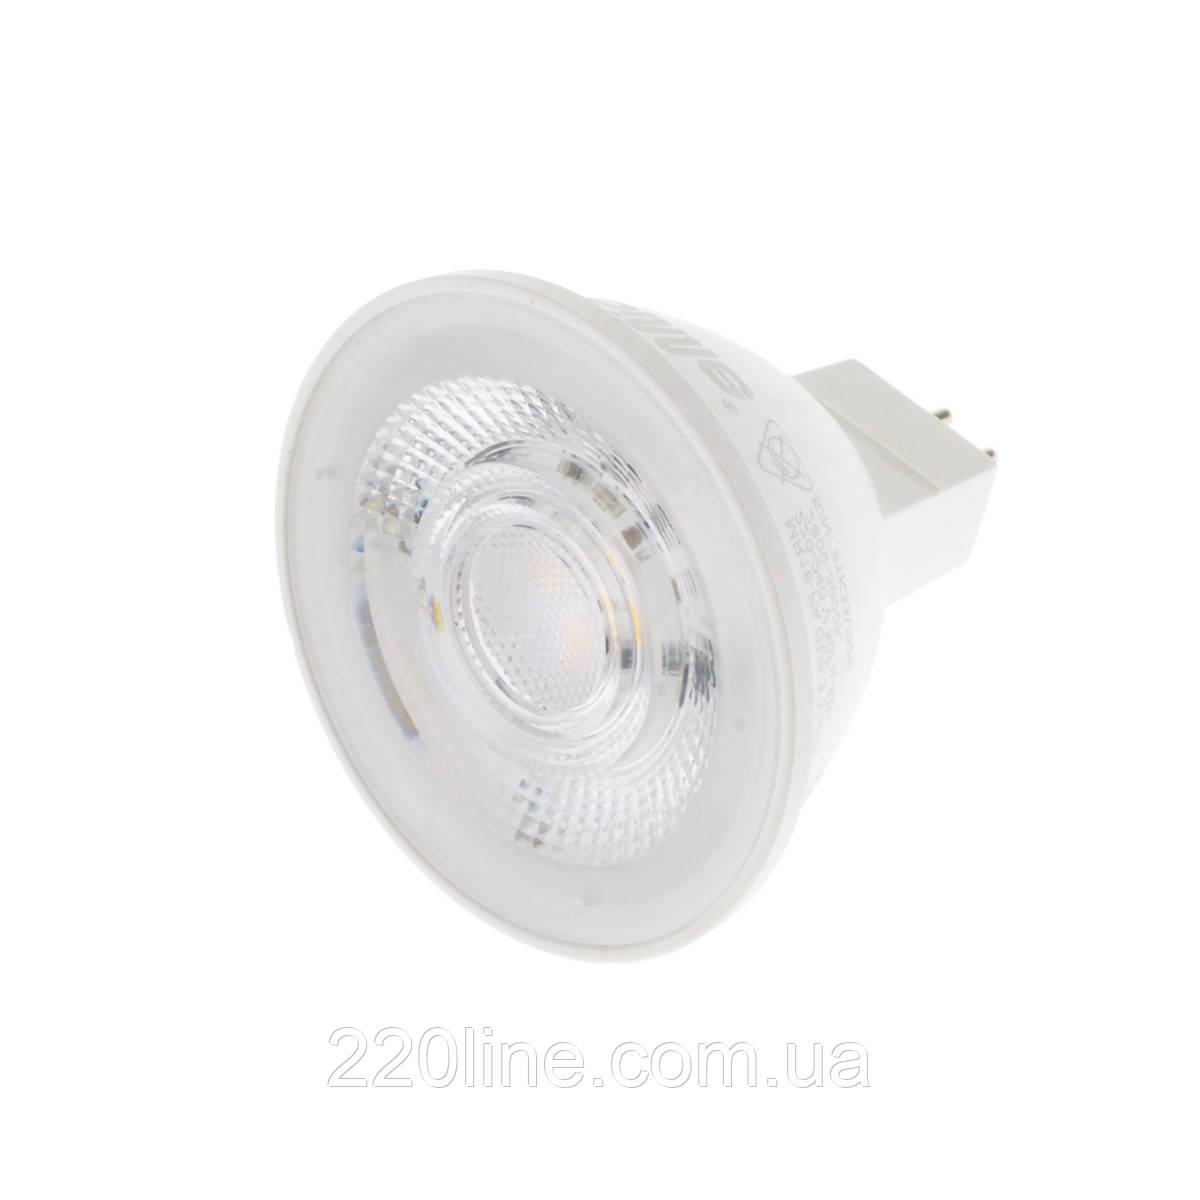 Лампа светодиодная GU5.3 LED 4W WW MR16-PA